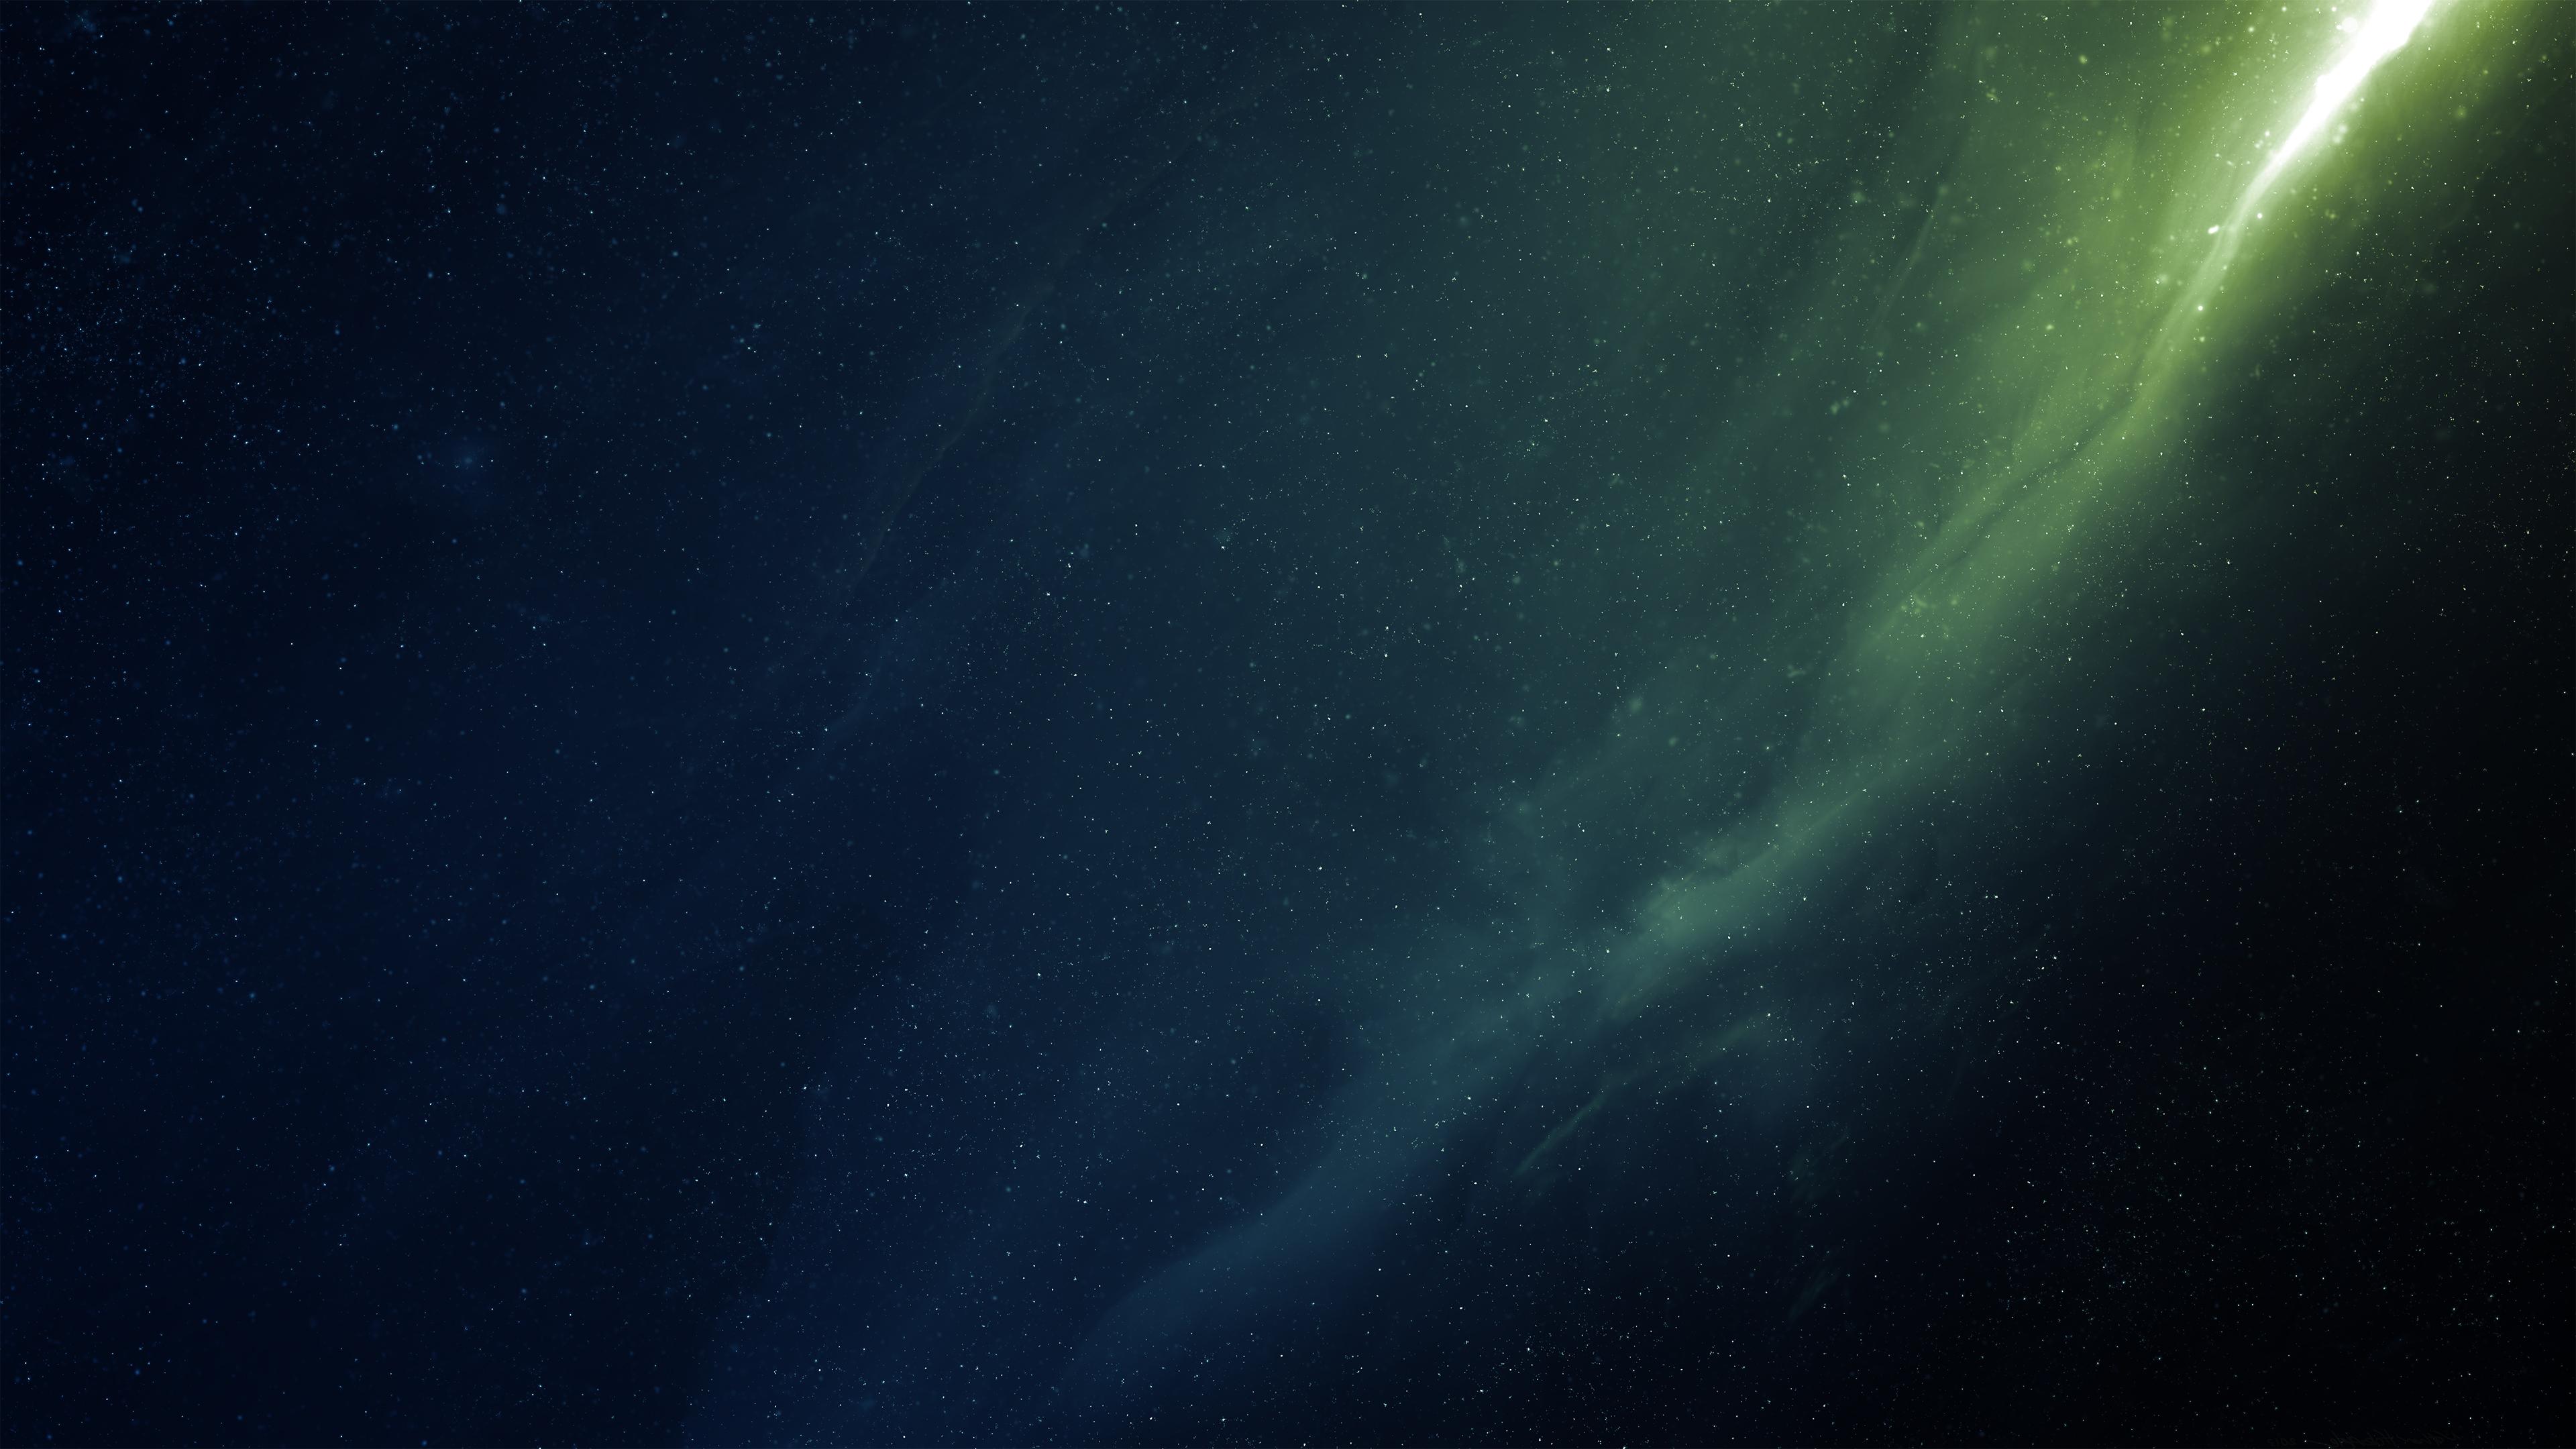 4k Nebula Space Hd Digital Universe 4k Wallpapers Images